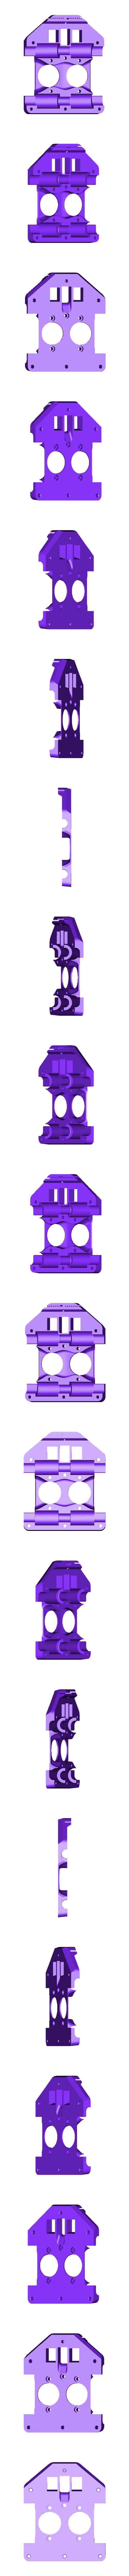 Dual_E3D_Mount_v4-4_BASEPLATE.STL Download free STL file Jellyfish Mount (RigidBot Dual E3Dv6) • 3D printer object, WalterHsiao